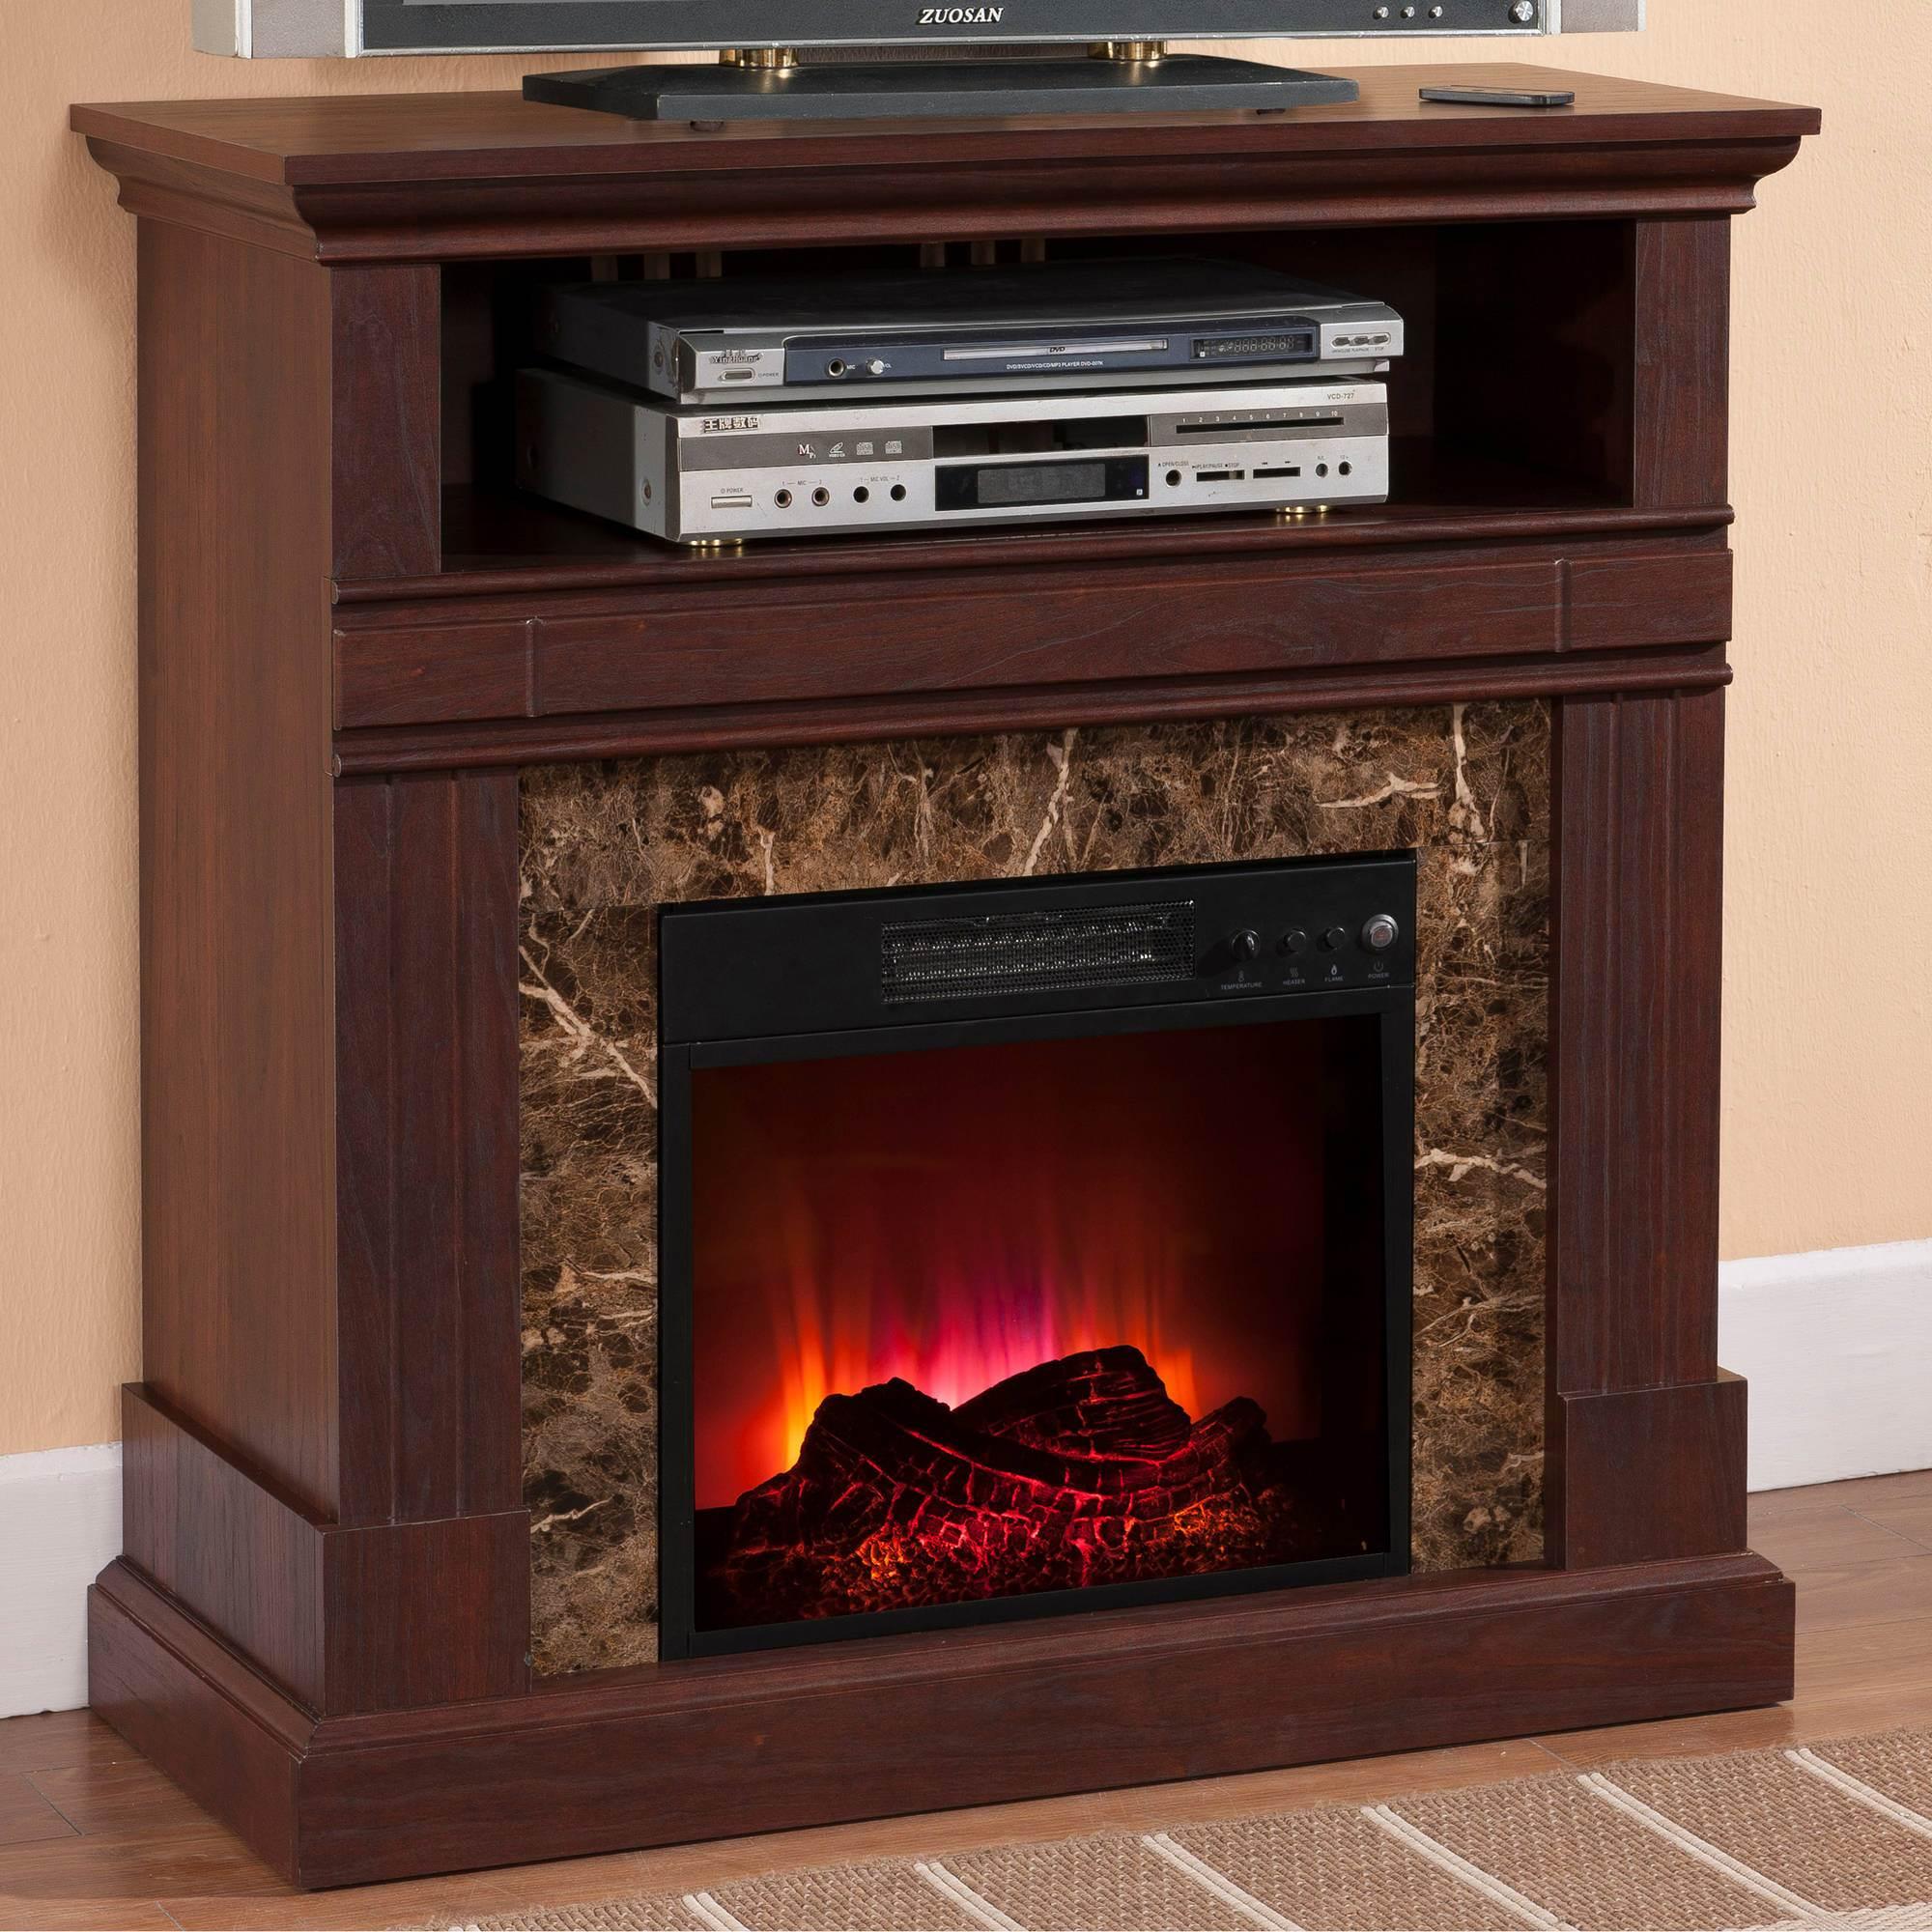 Small Corner Electric Fireplace Best Of Corner Electric Fireplace Tv Stand